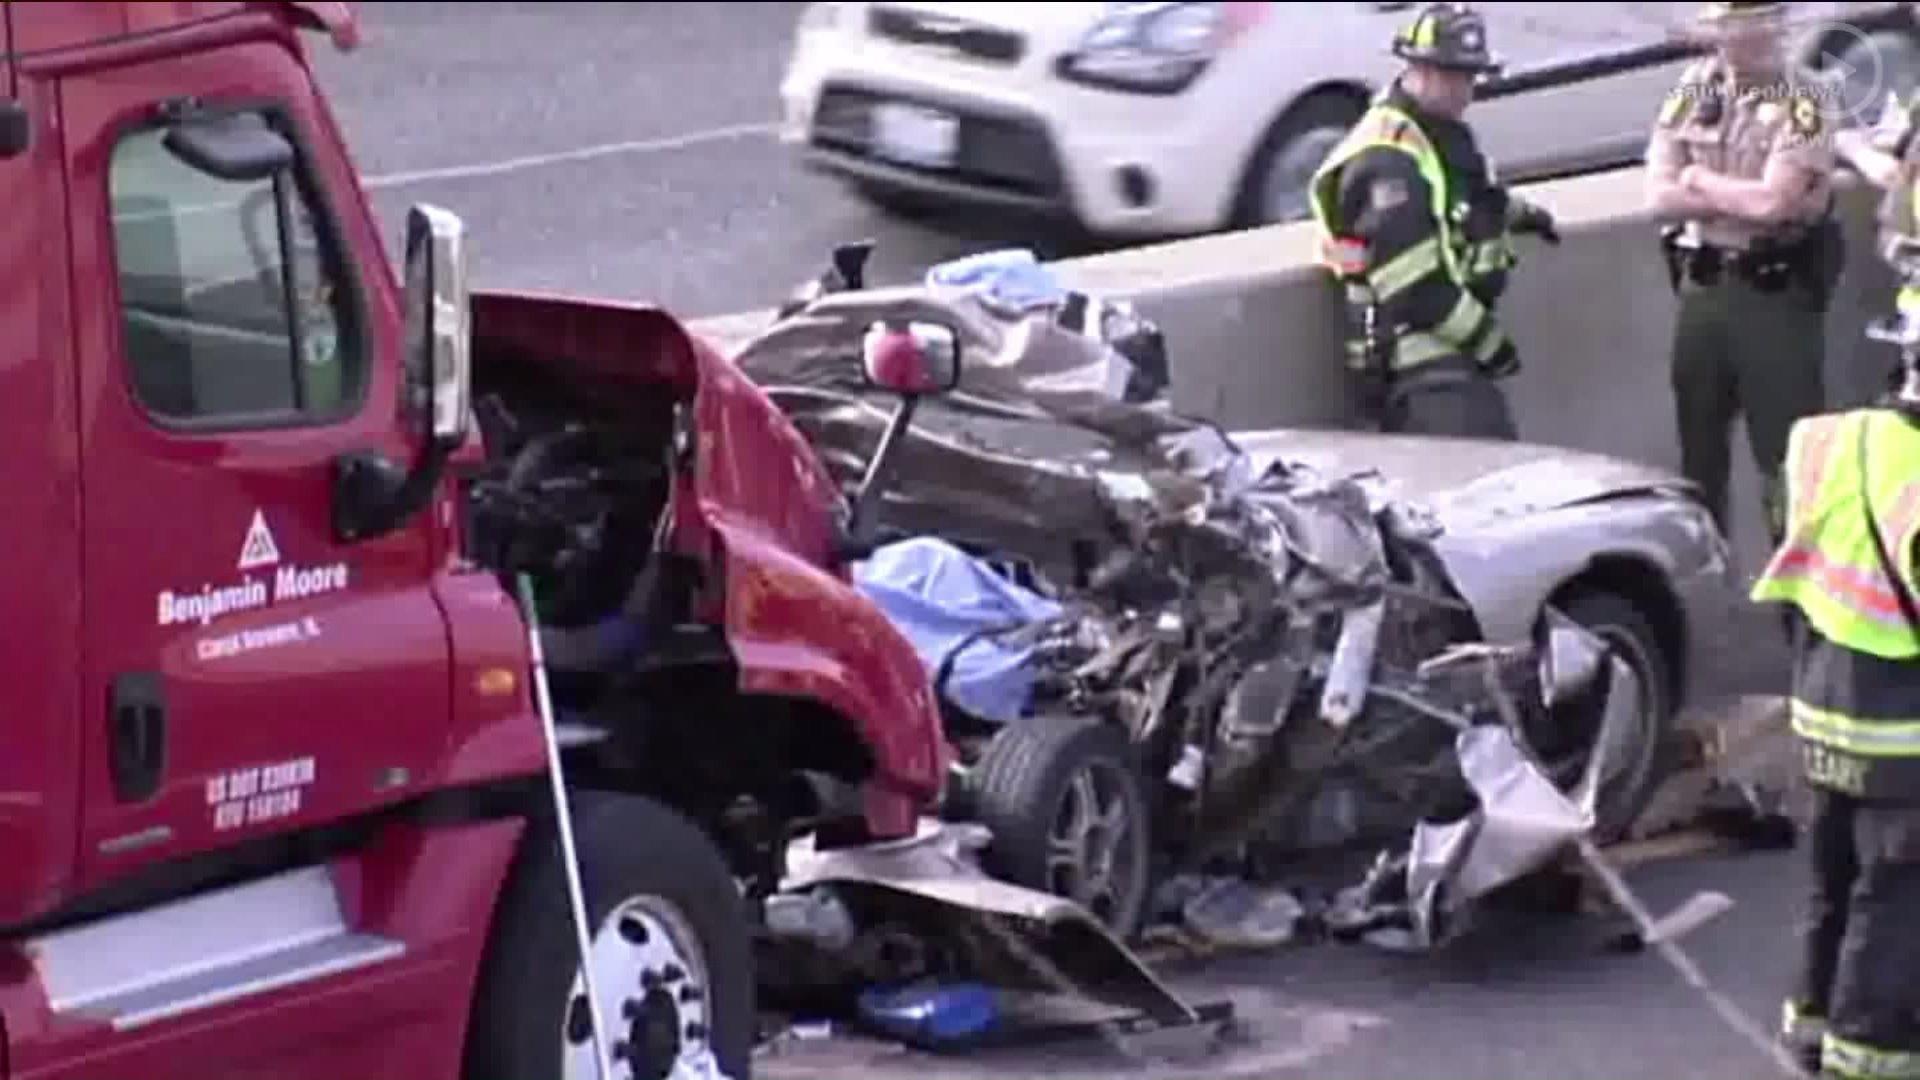 On the scene: Fatal crash on I-55 causes long delays - Chicago Tribune